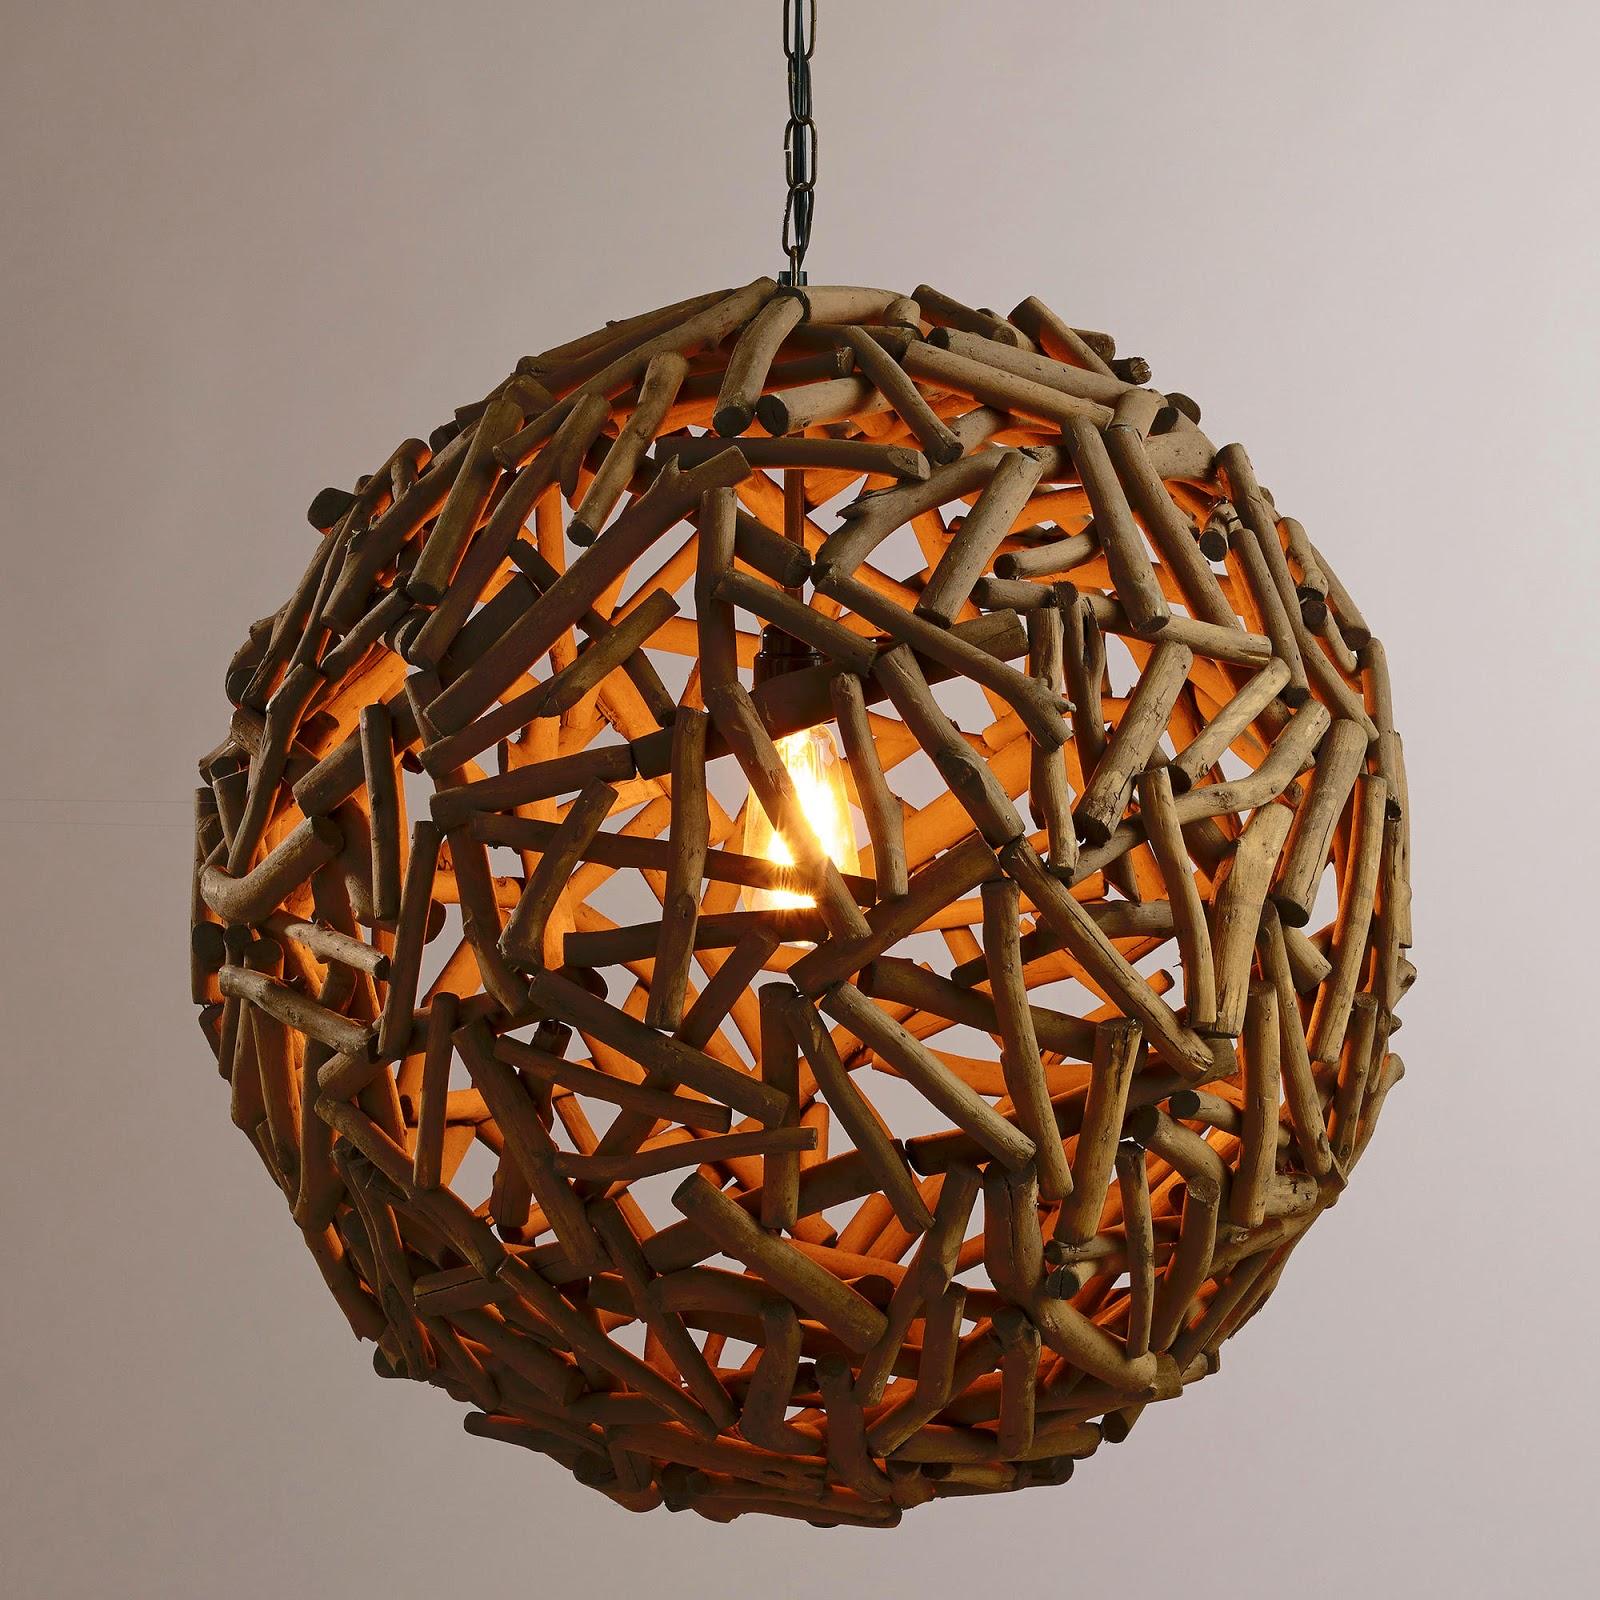 Restoration Hardware Lighting Orb: {Jessica Stout Design}: World Market Vs. Restoration